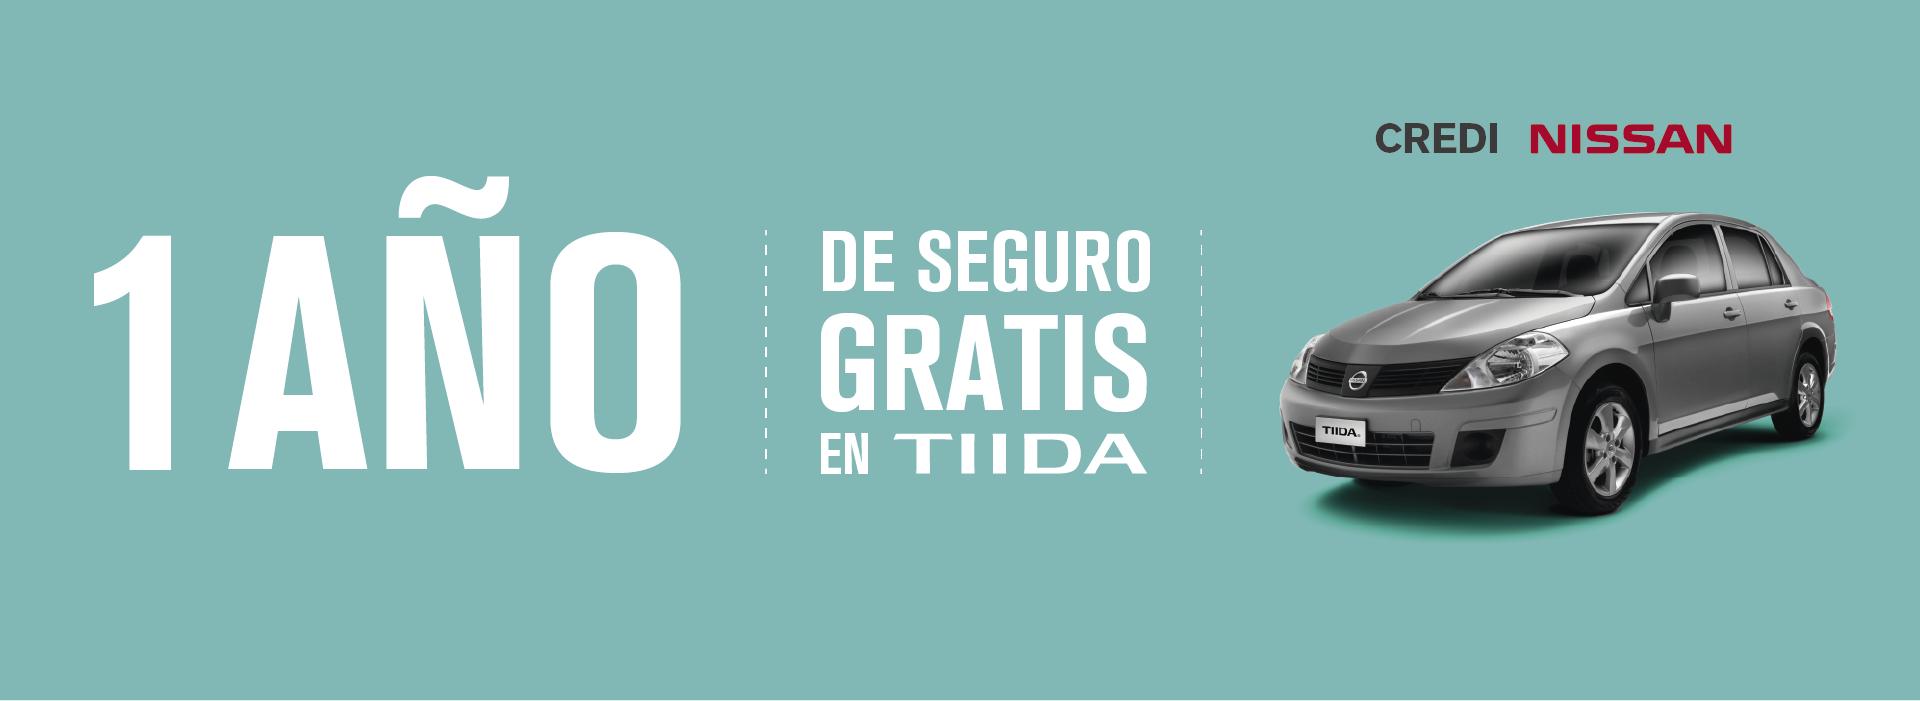 Tiida Nissan Seguro GRATIS Toluca Metepec San Mateo Zinacantepec Almoloya